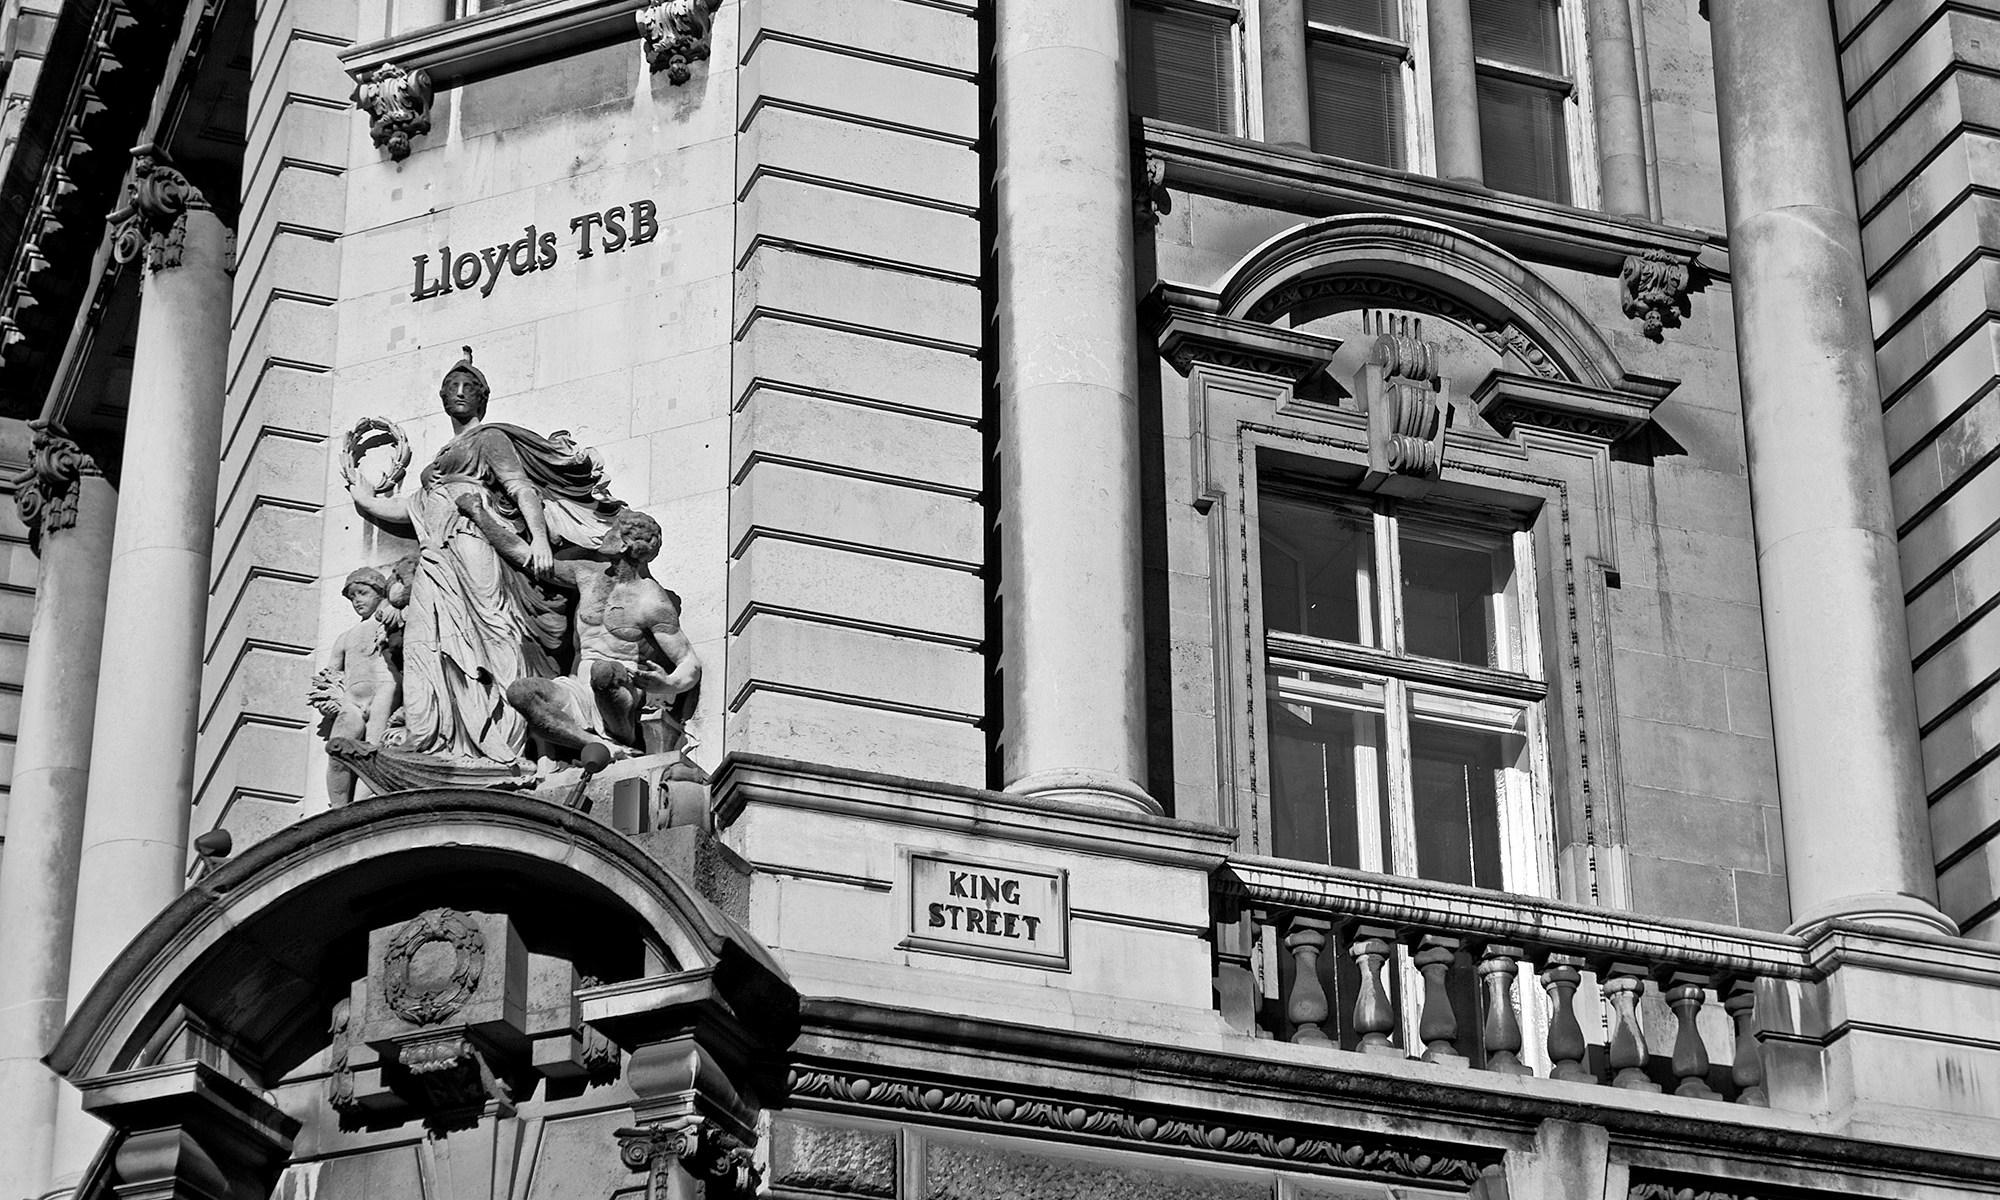 Lloyds TSB on King Street, Manchester